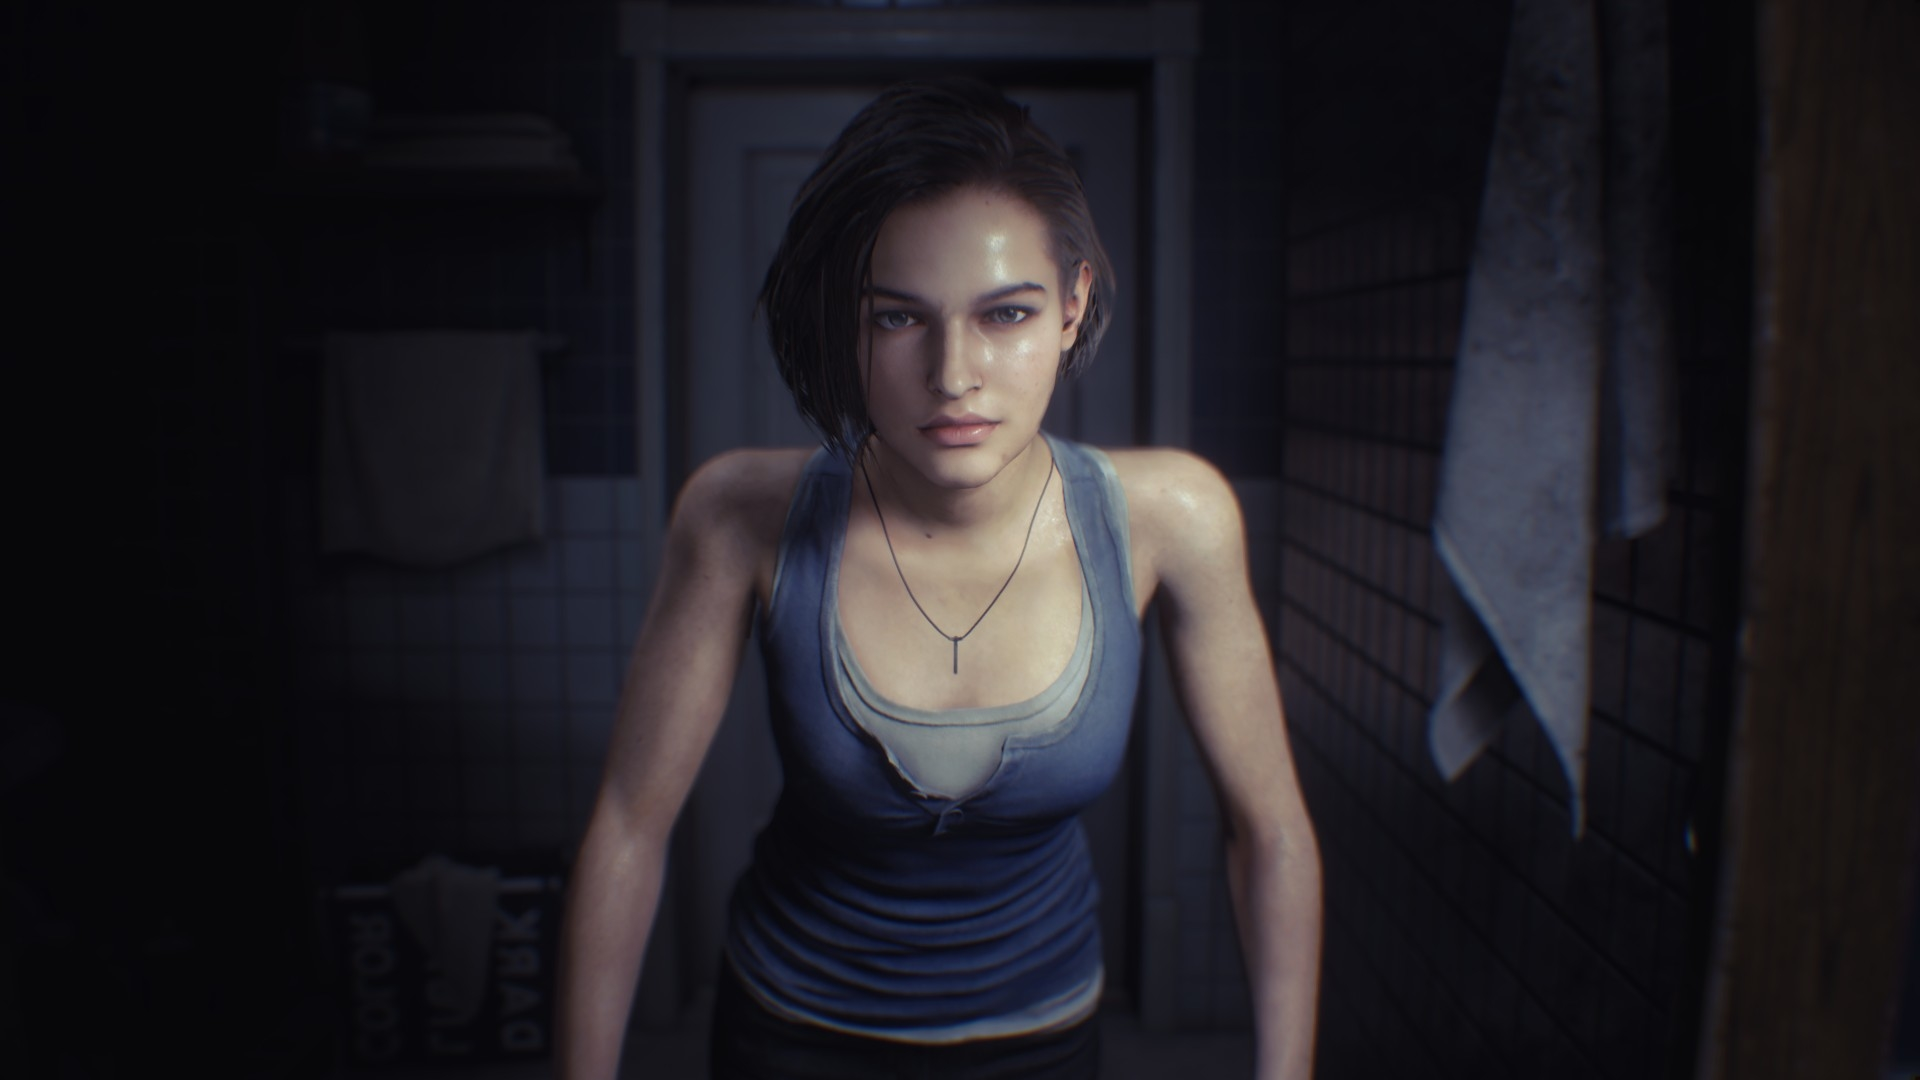 Jill Valentine Resident Evil 3 Remake Wallpaper Hd Games 4k